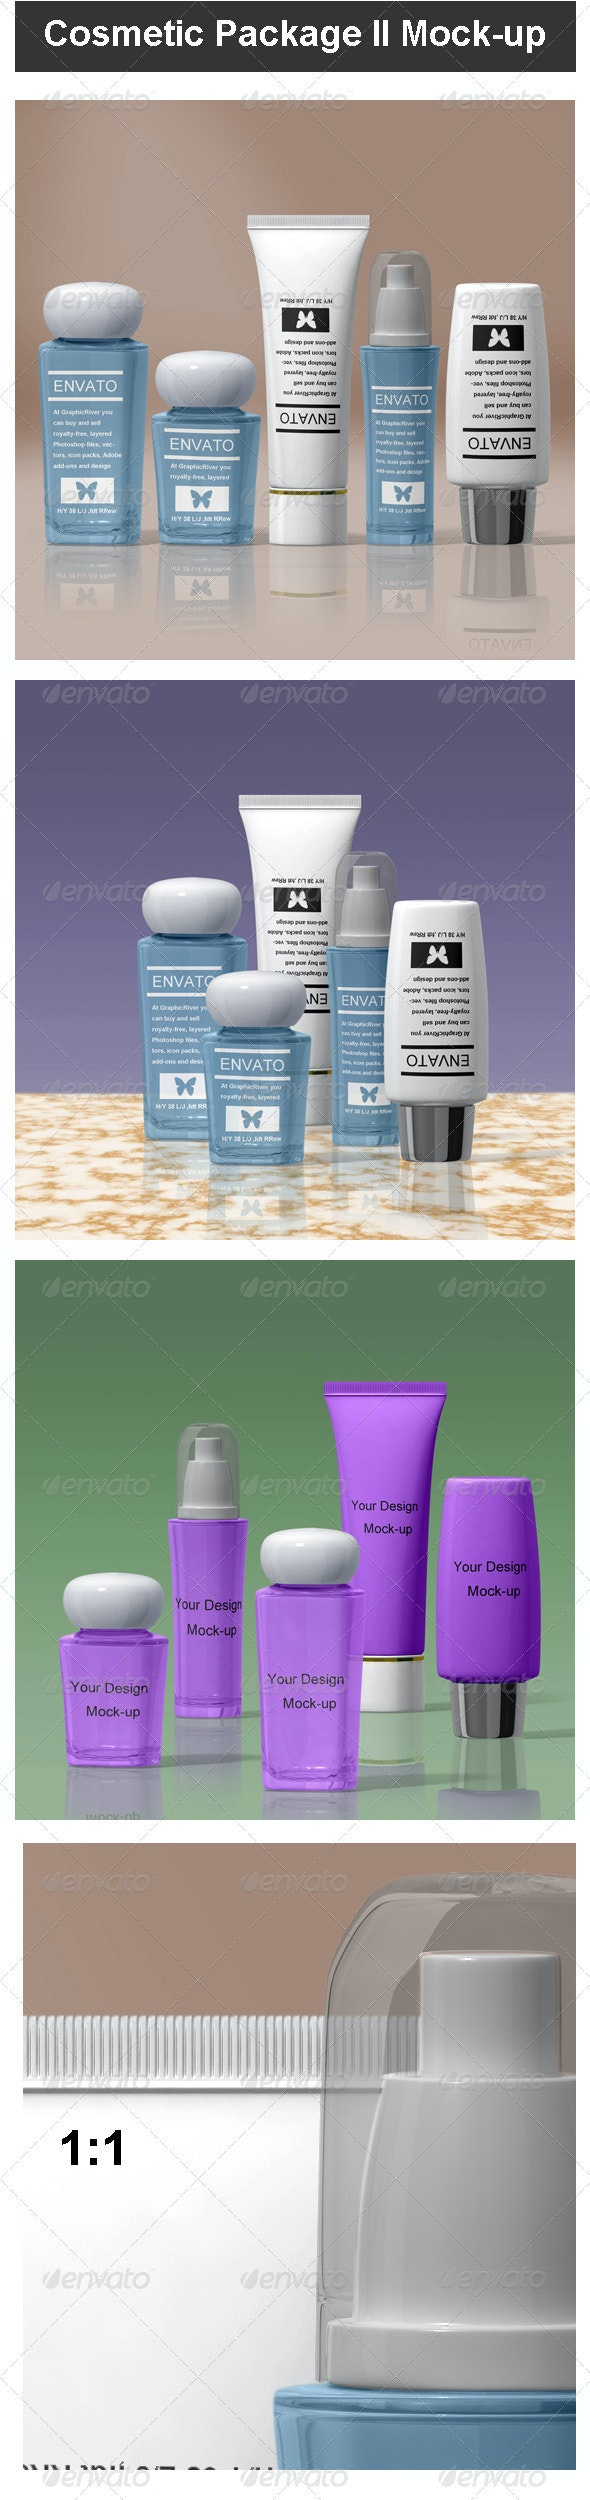 Cosmetic Package II Mock-up - Beauty Packaging